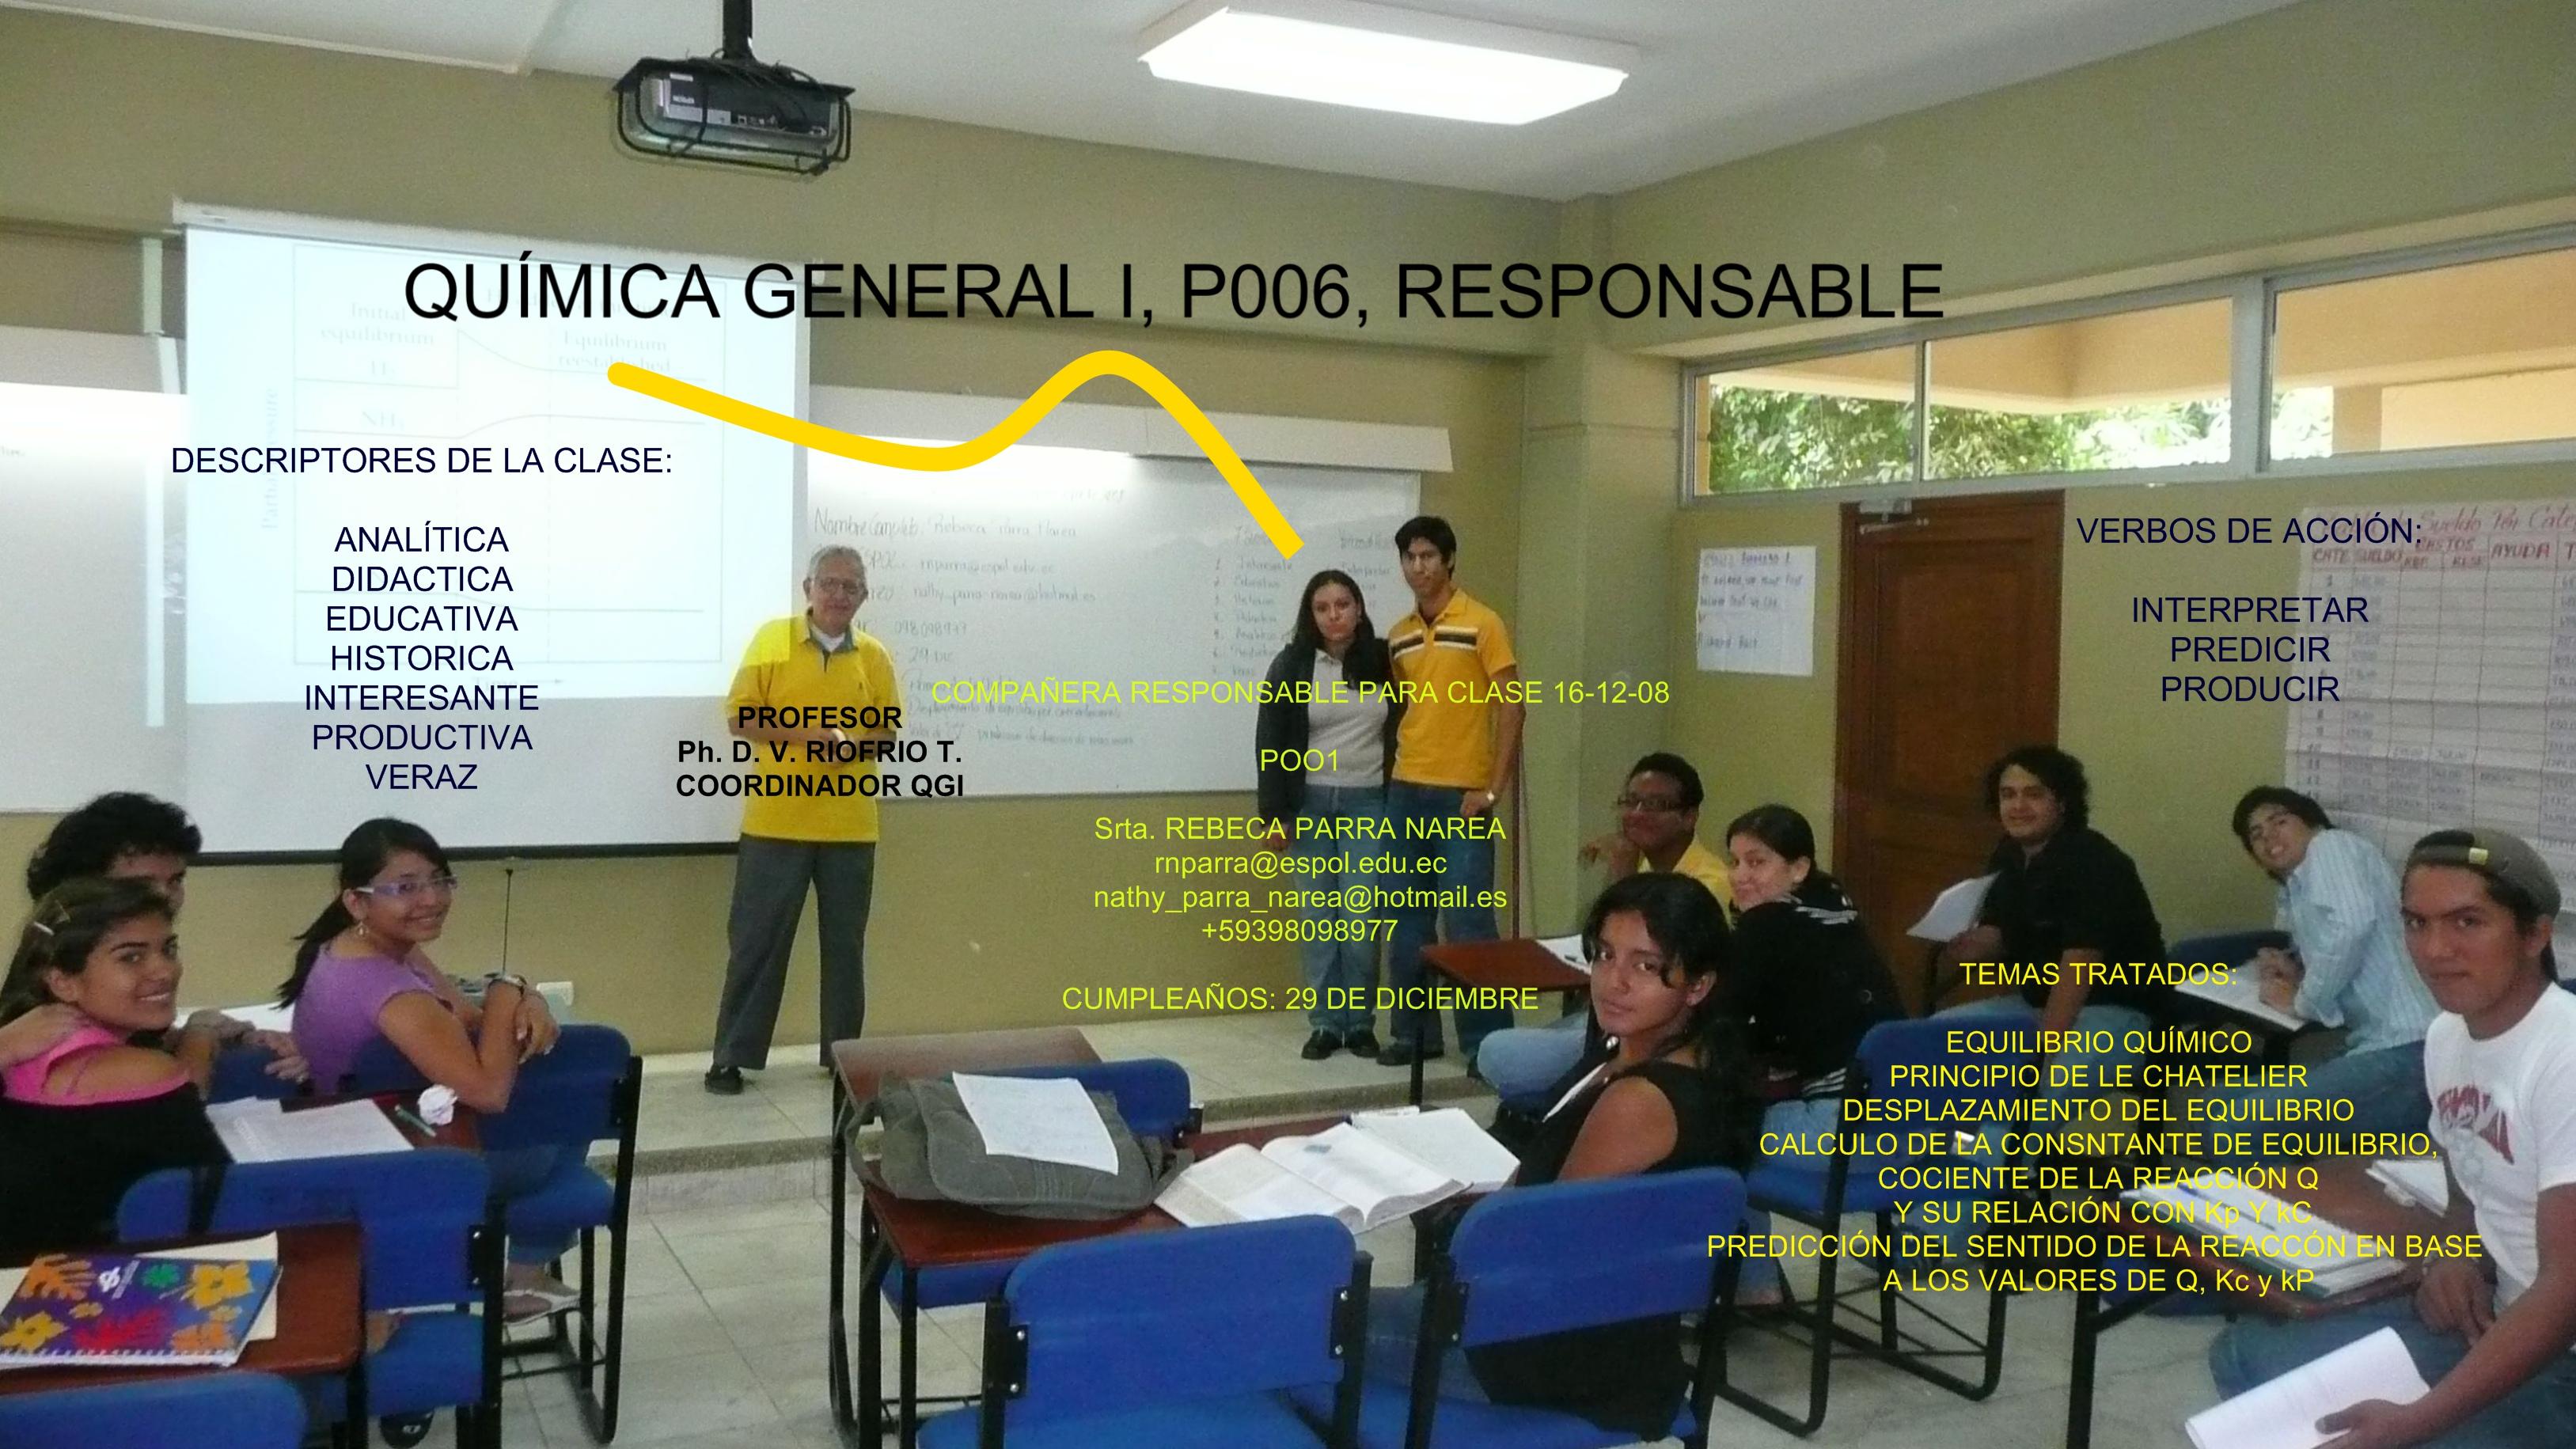 COMPAÑERA RESPONSABLE PARA CLASE 16-12- 08 / Srta. REBECA PARRA N.